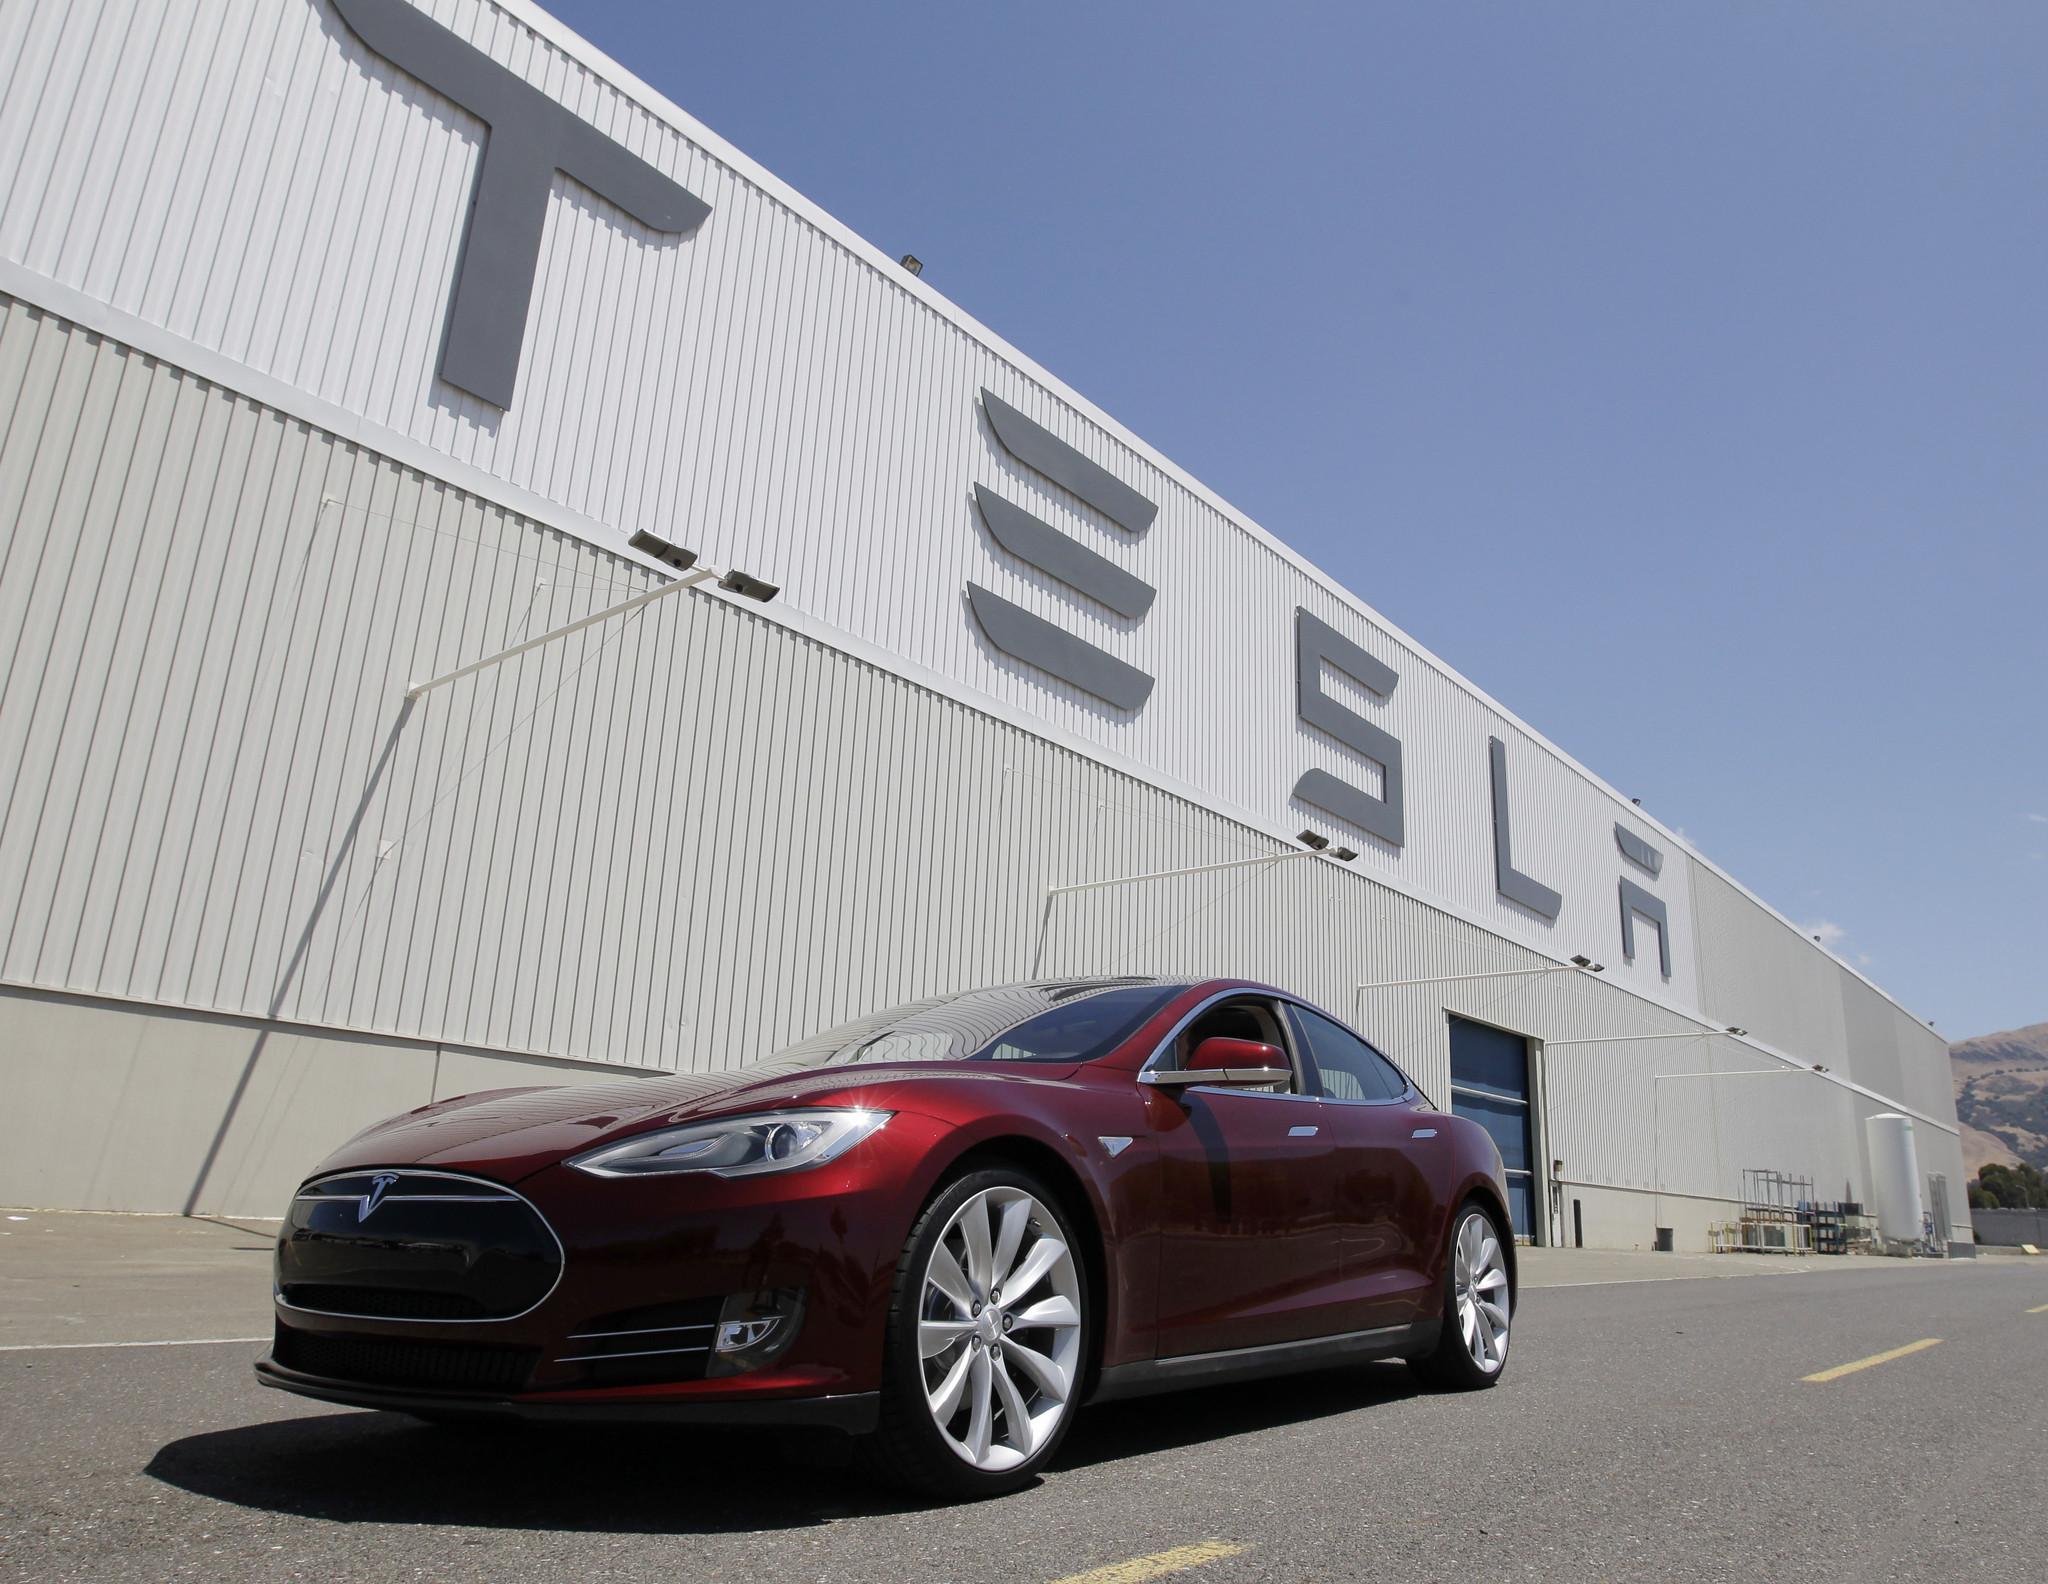 Tesla Motors Upgrades Equipment, Factory and the User